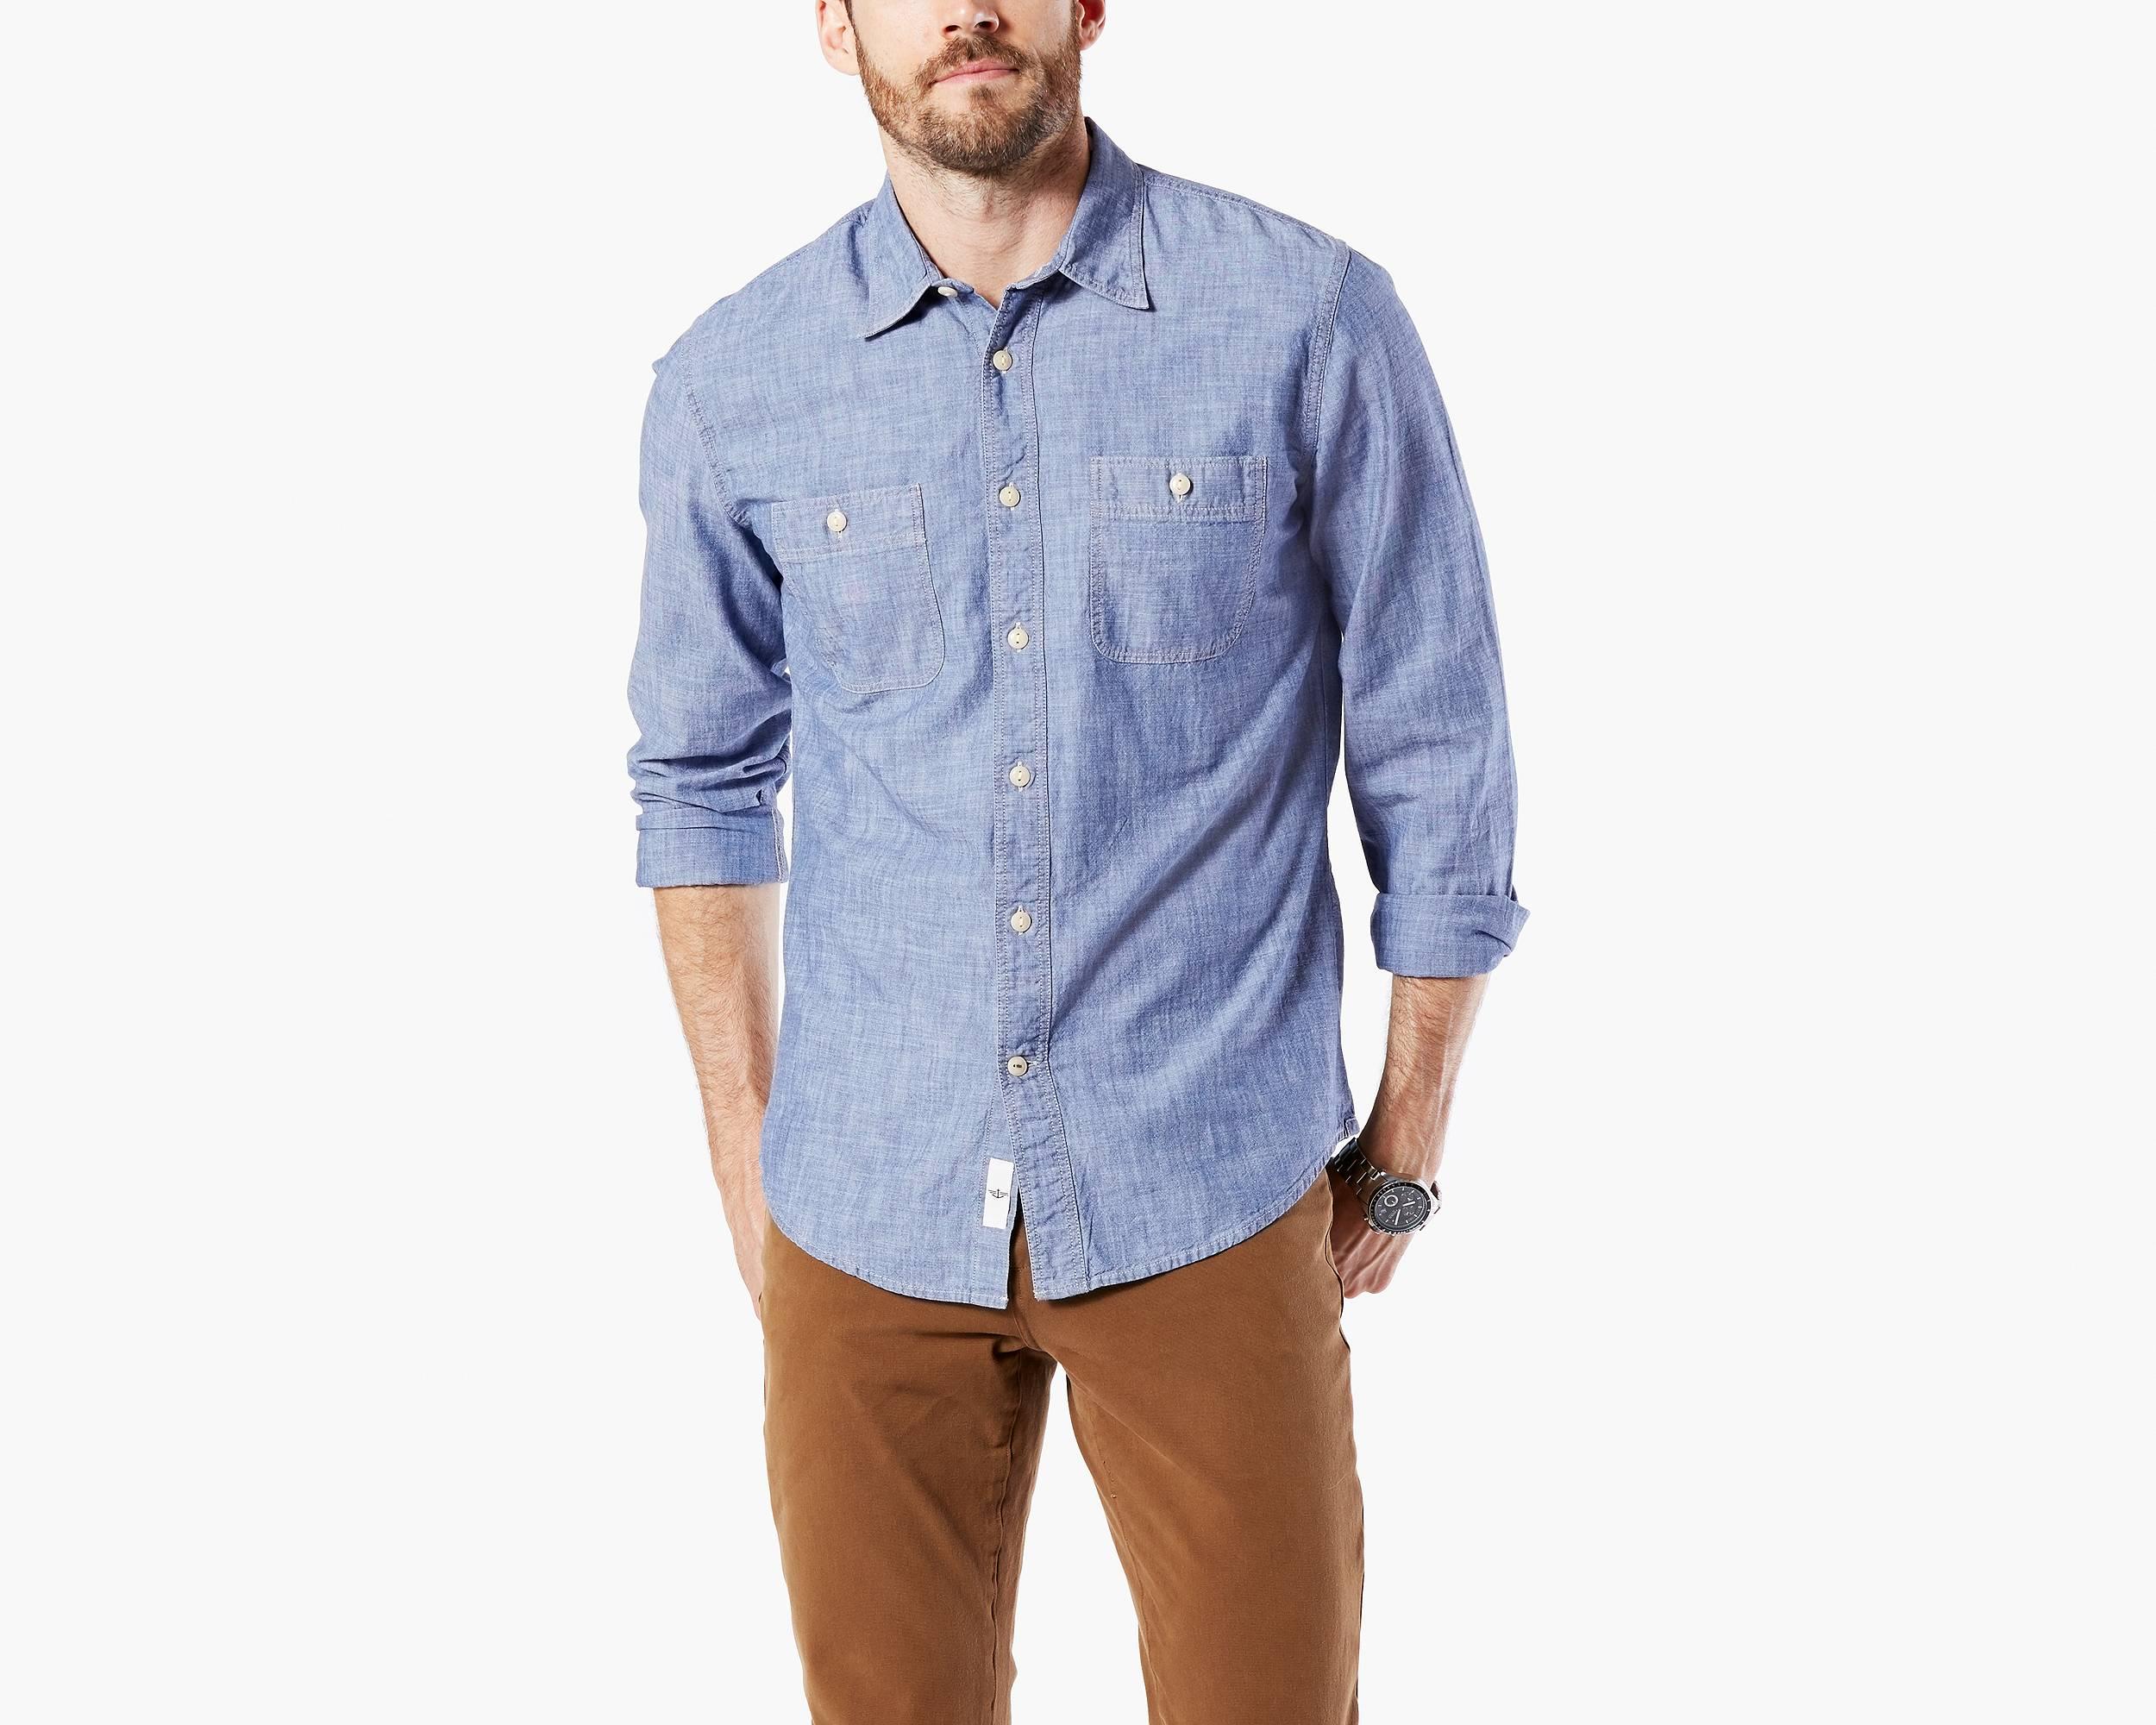 Mens Long Sleeve V Neck Tee Shirts